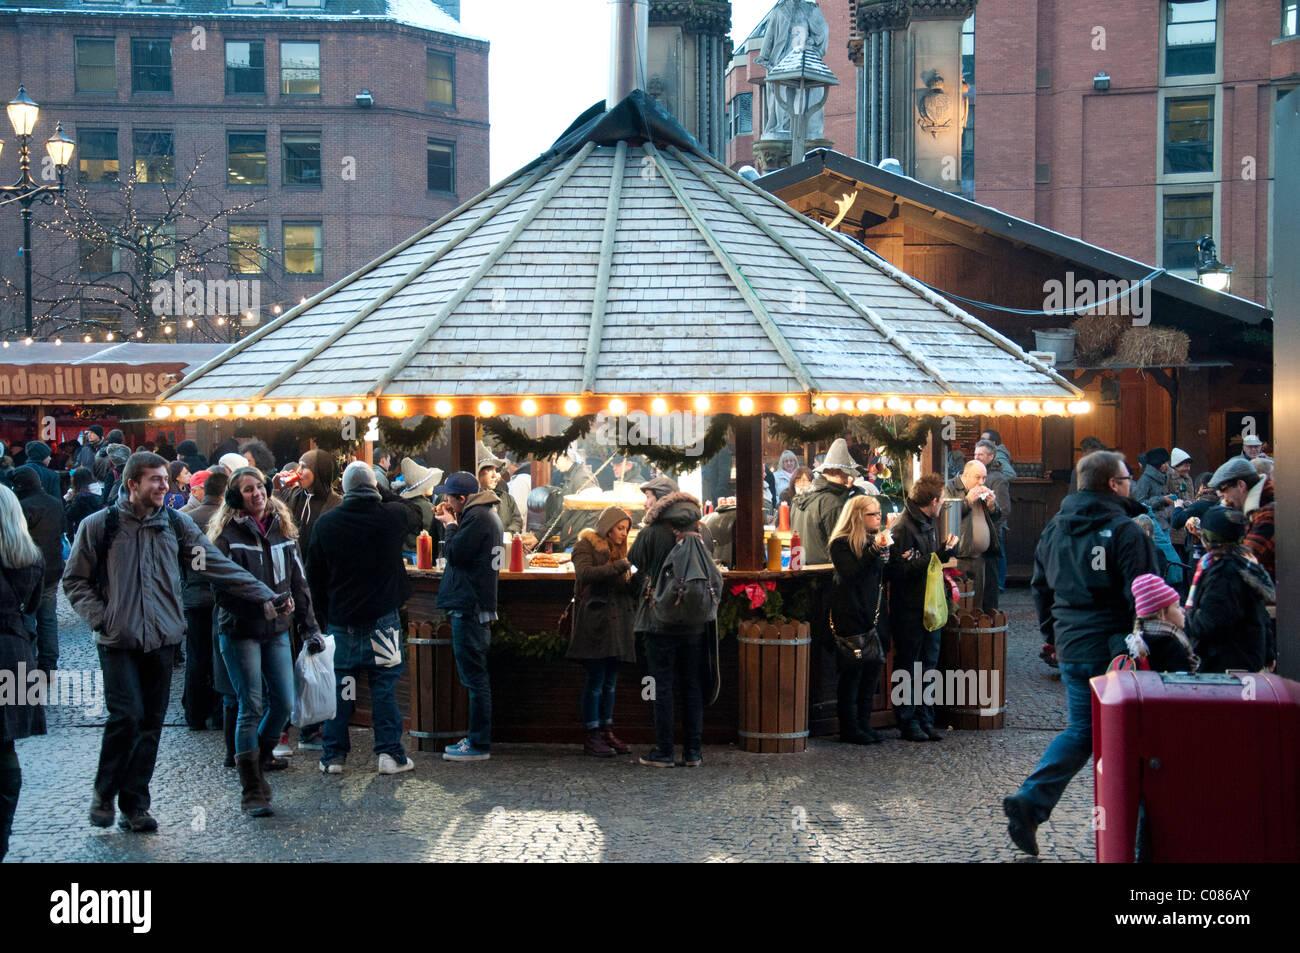 The Christmas Markets at Albert Square Manchester England November December 2010 - Stock Image